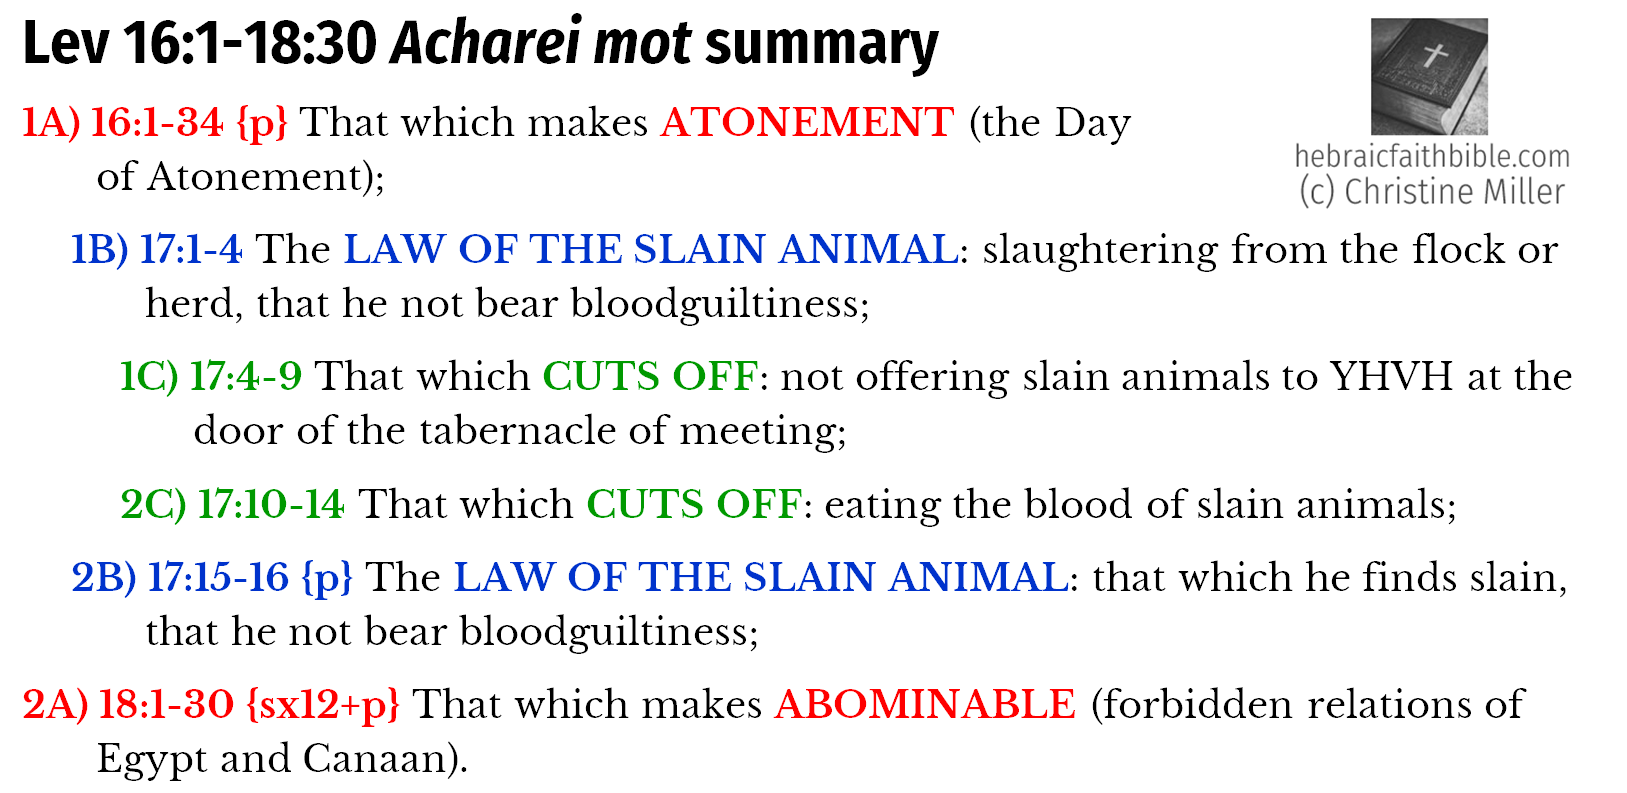 Lev 16:1-18:30 Acharei mot chiasm summary   hebraicfaithbible.com